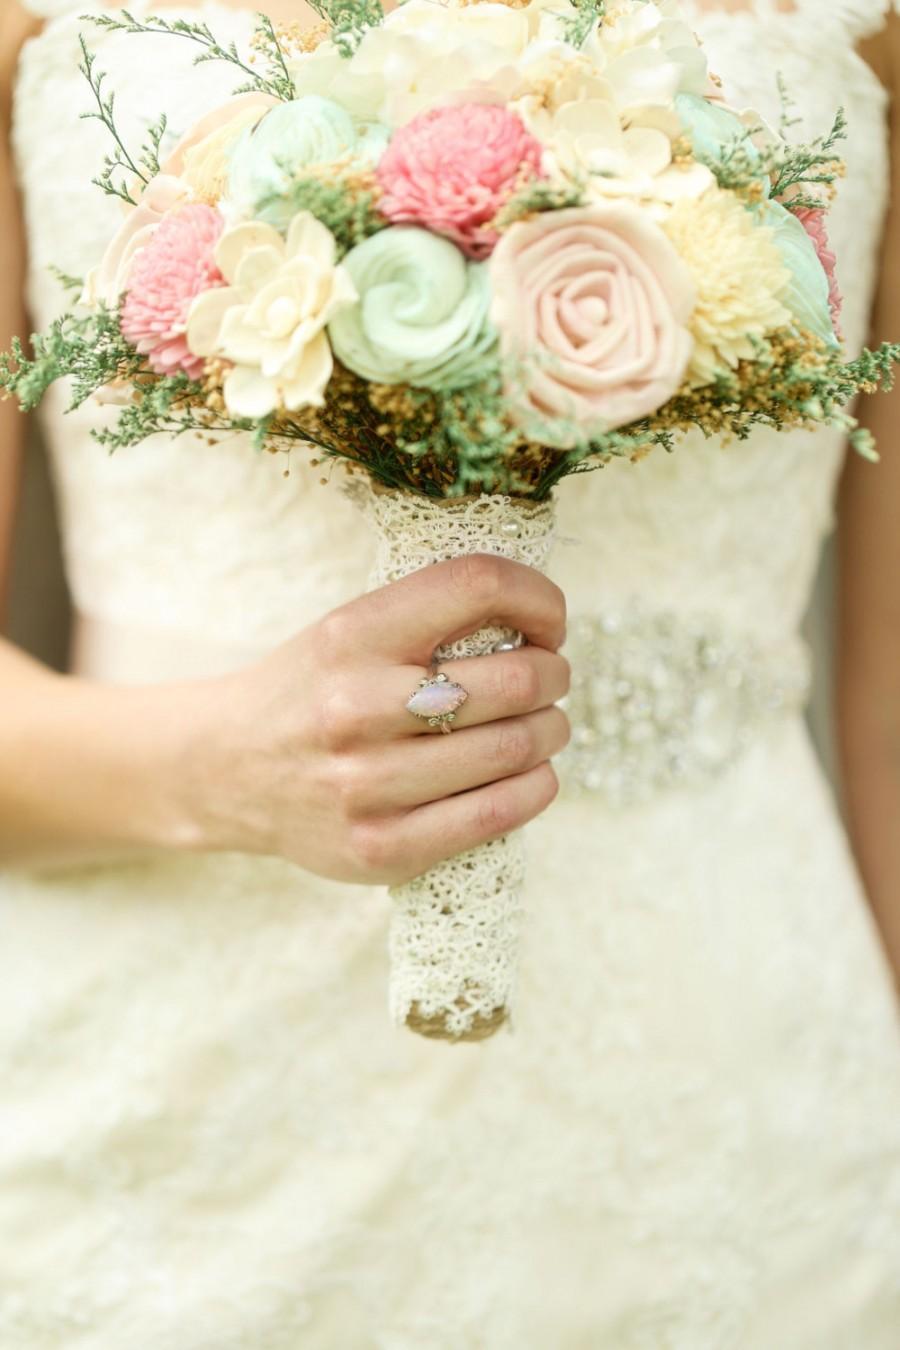 Свадьба - Romantic Wedding Bouquet -Pink and Mint Collection, Large Keepsake Alternative Bouquet, Sola Bouquet, Rustic Wedding